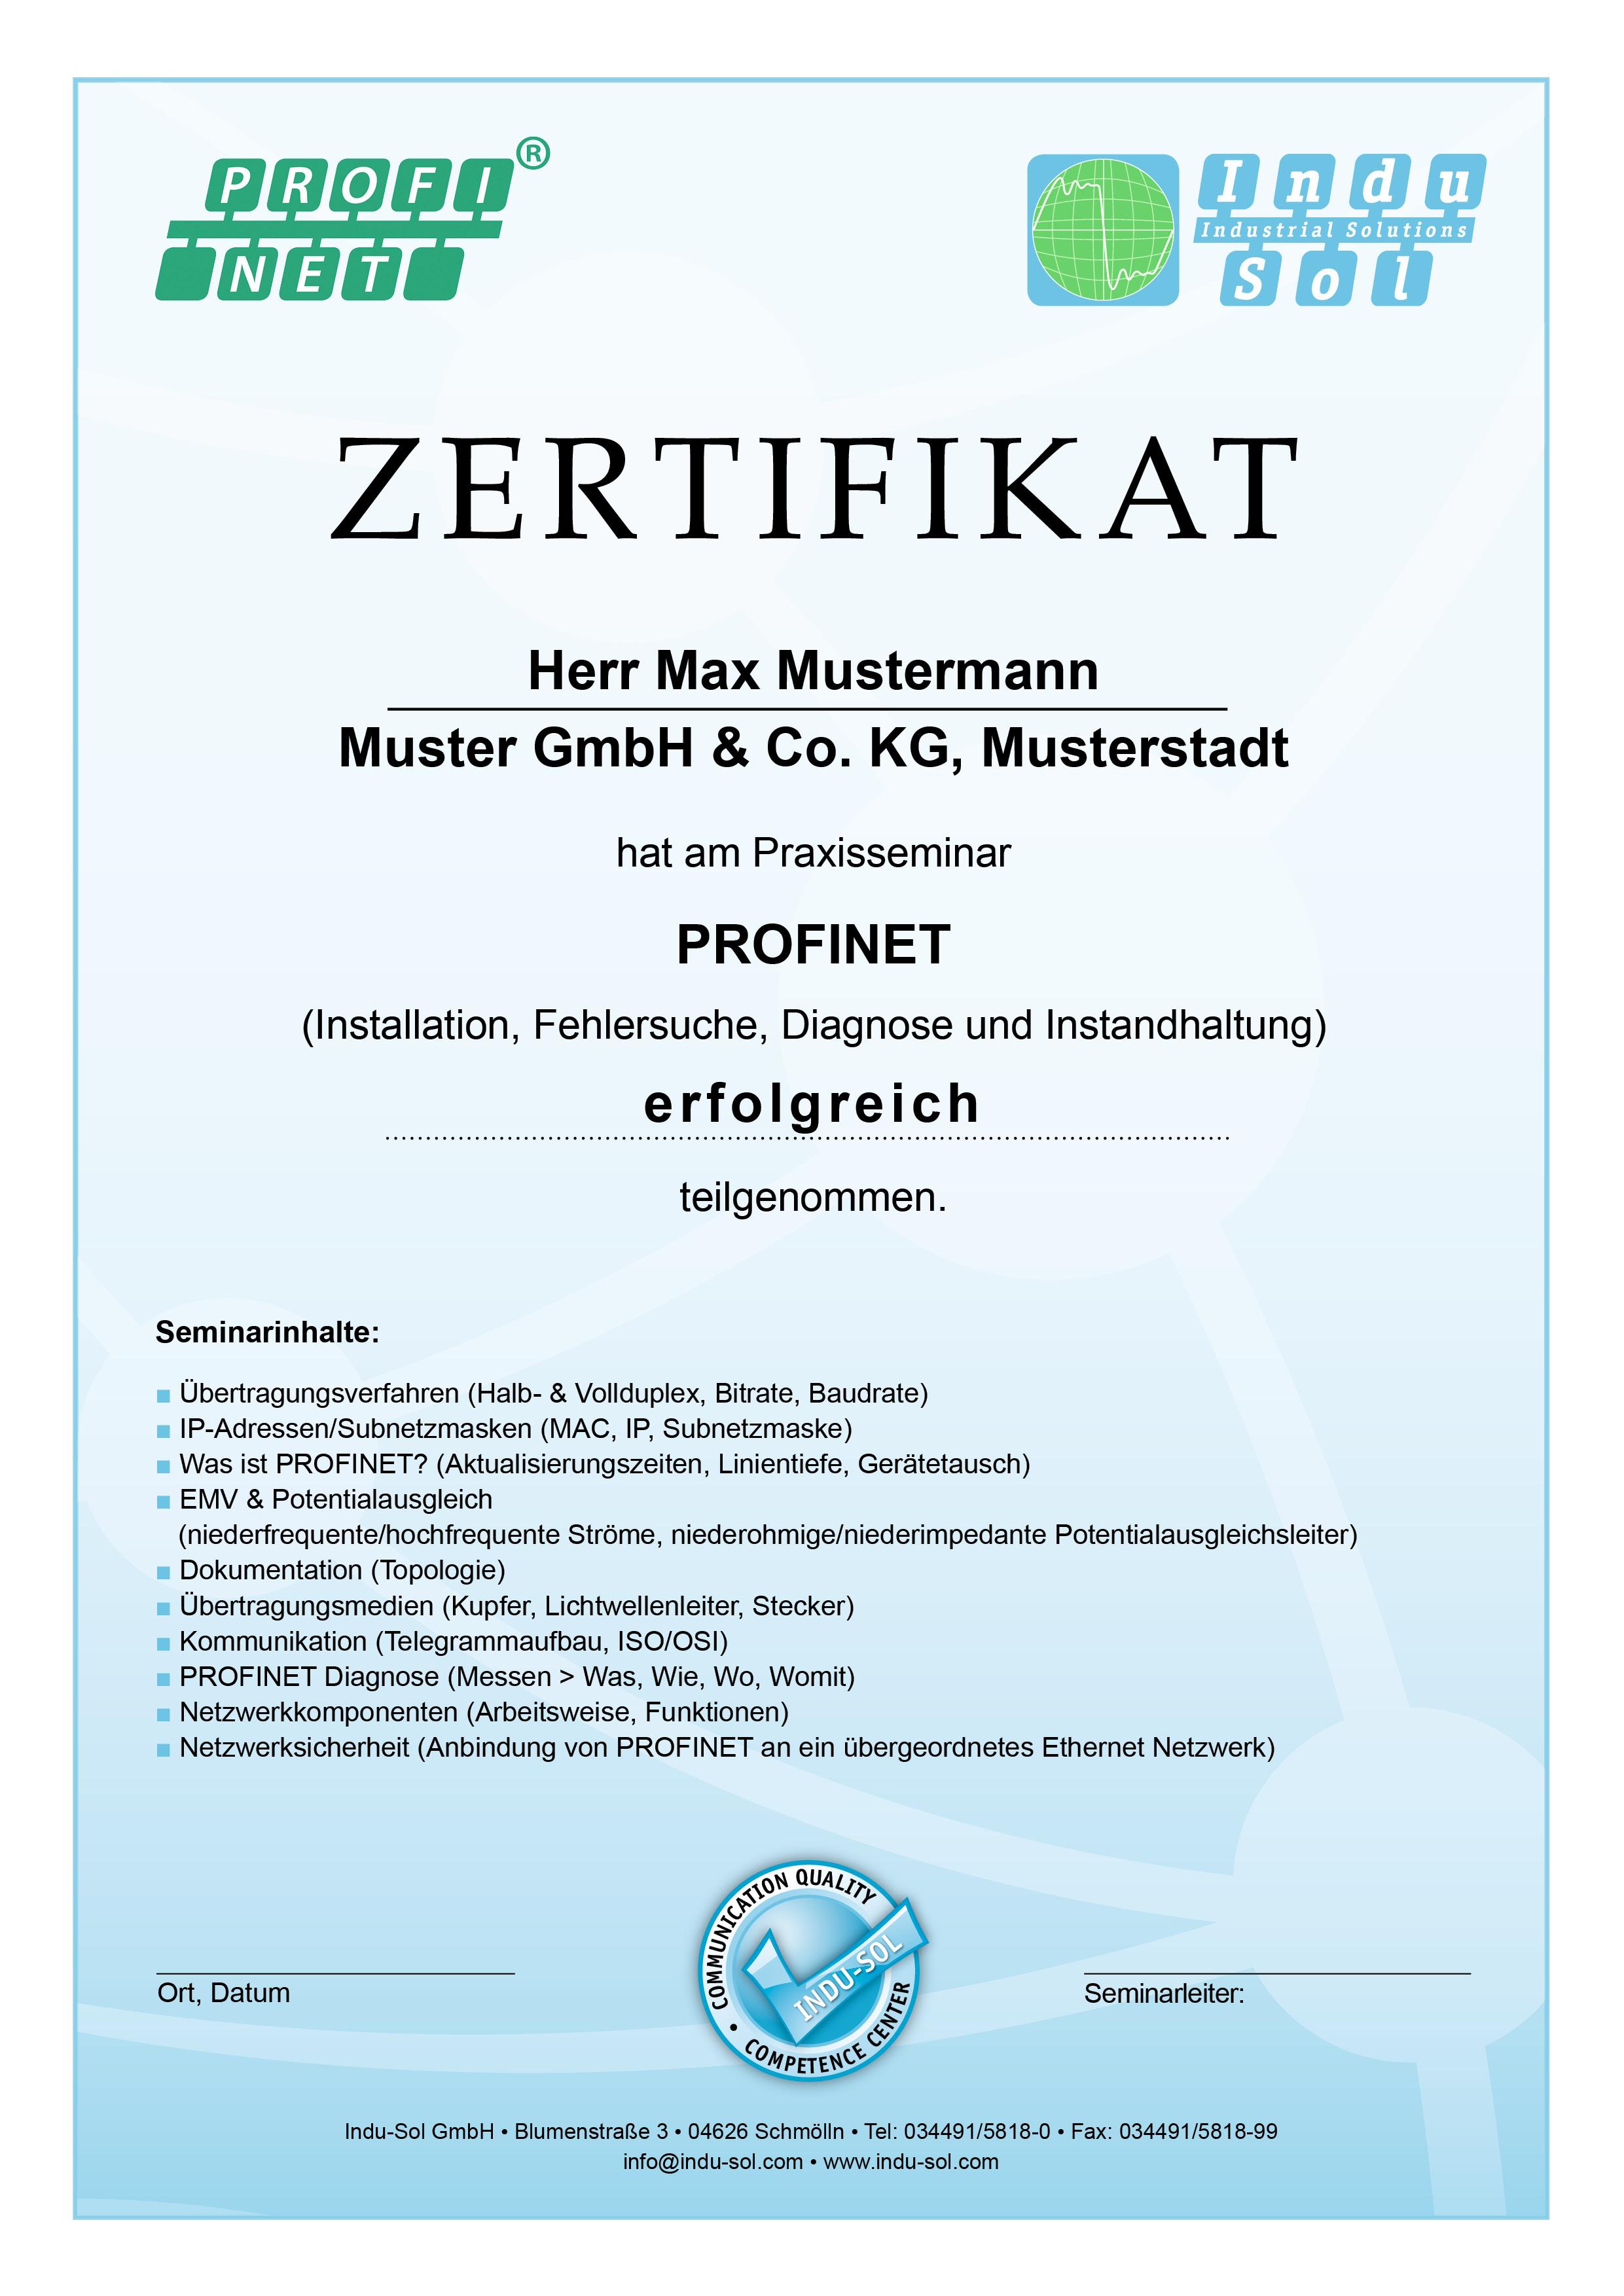 Berühmt Zertifizierungszertifikat Vorlage Fotos - Entry Level Resume ...